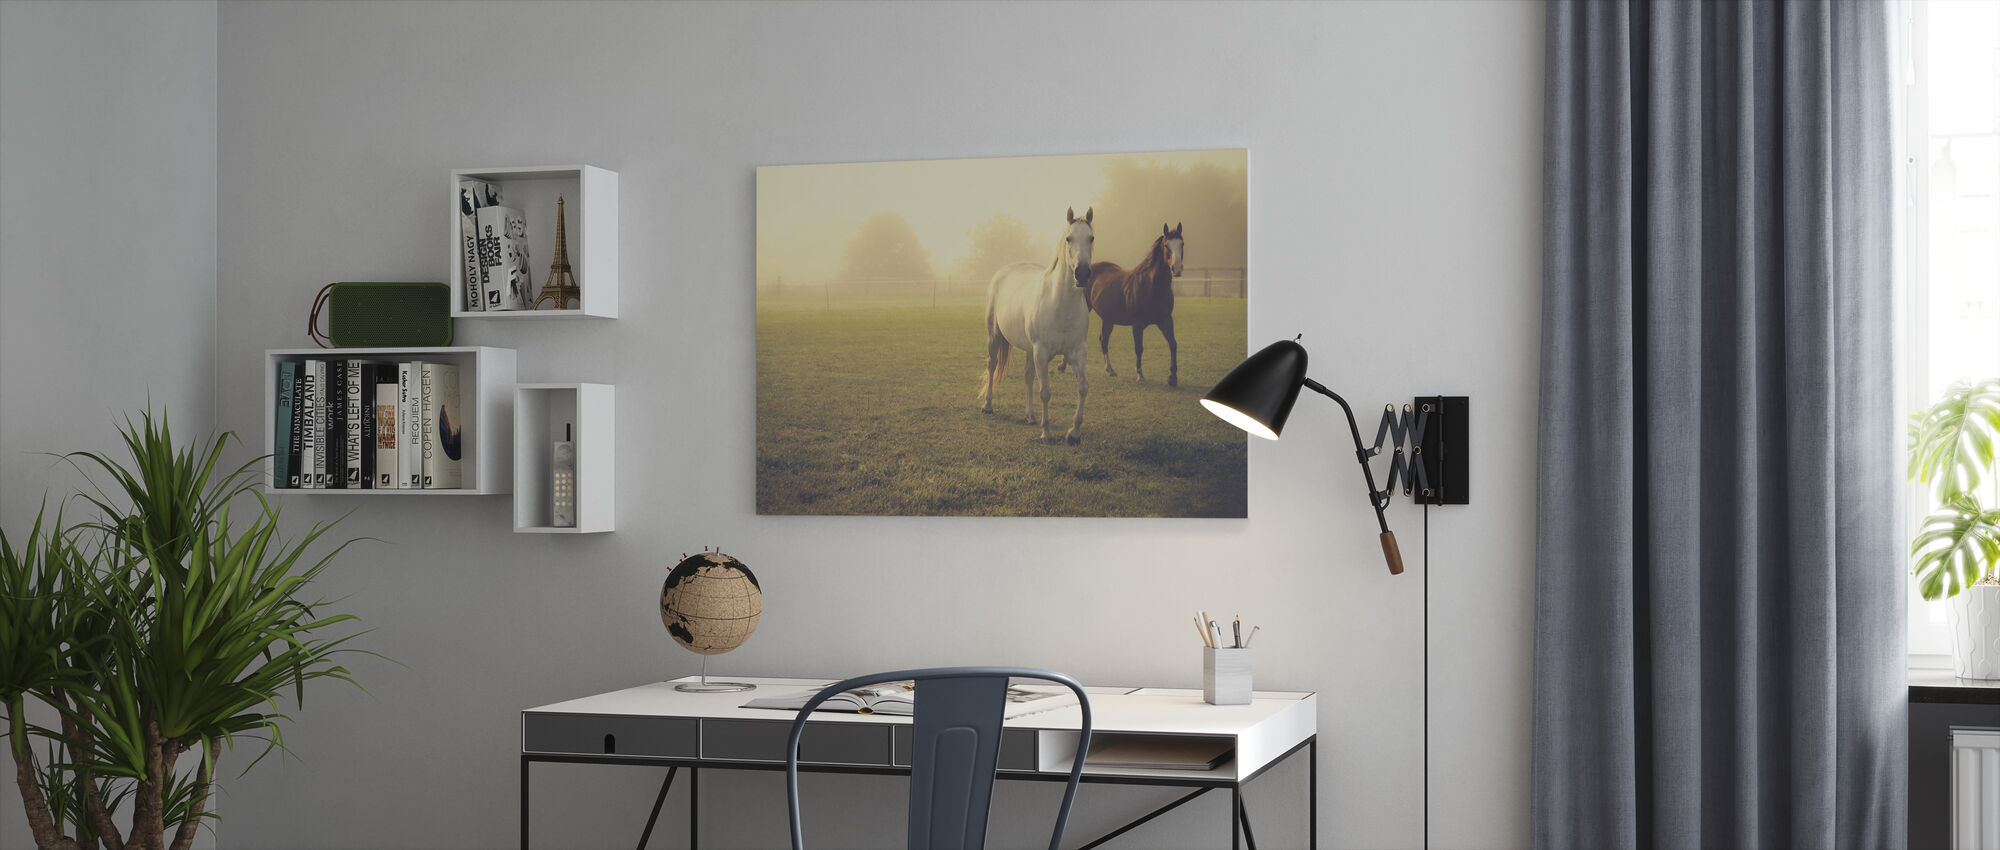 Quarter Horses in Morning Fog - Canvas print - Office